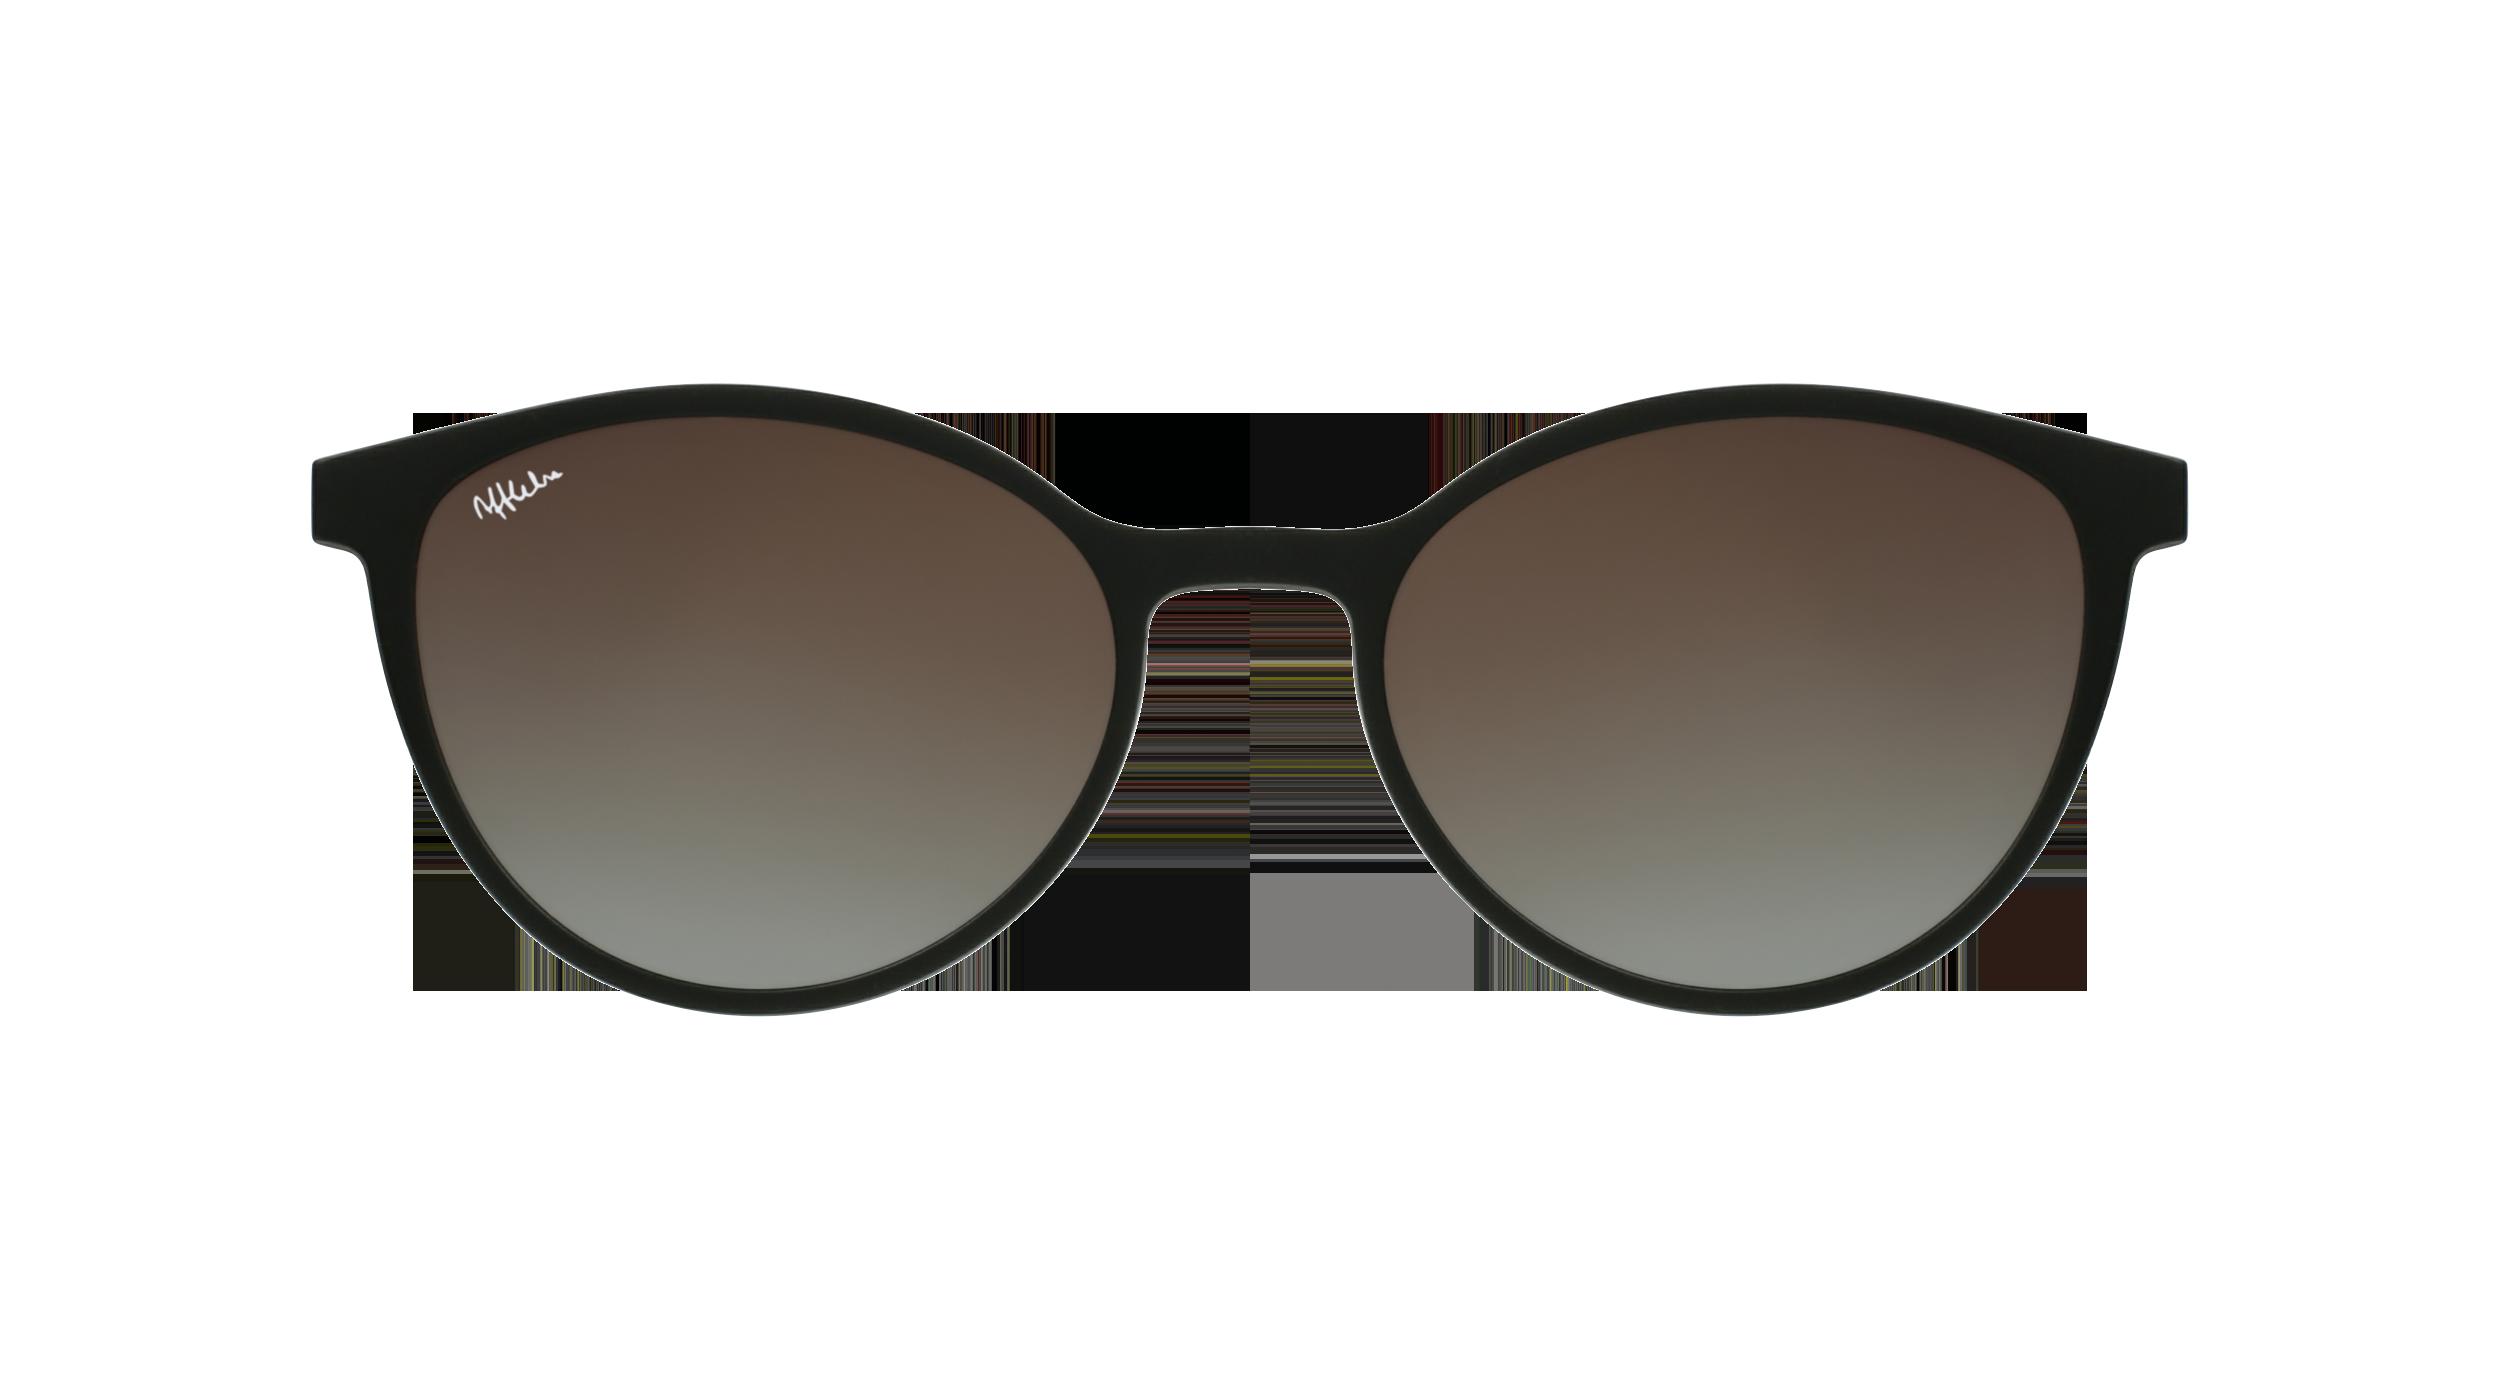 afflelou/france/products/smart_clip/clips_glasses/07630036458921.png